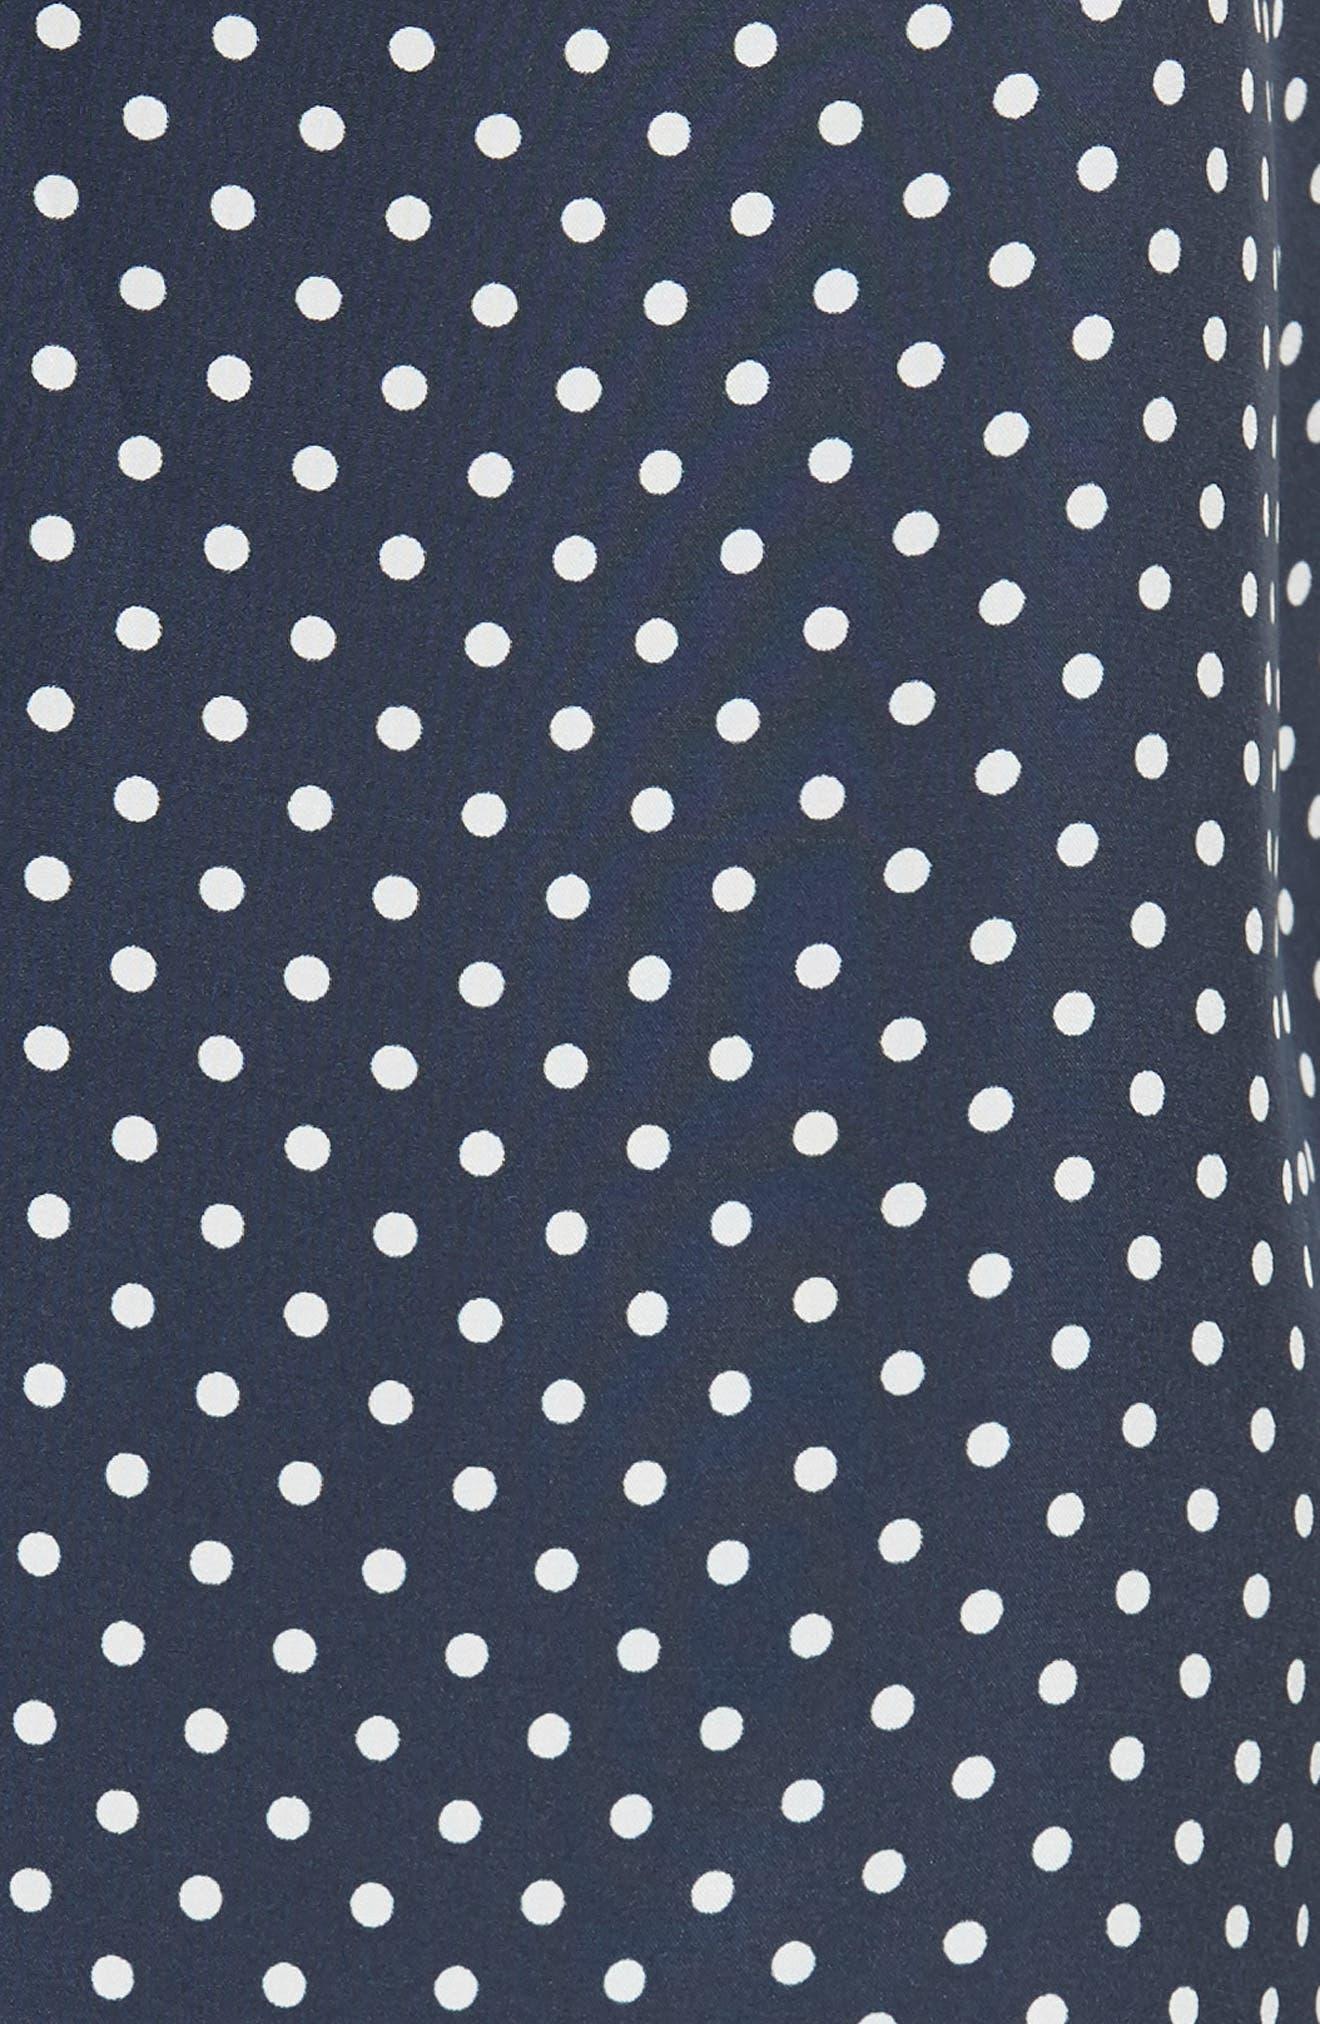 Polka Dot Silk Camisole,                             Alternate thumbnail 5, color,                             Midnight/ White